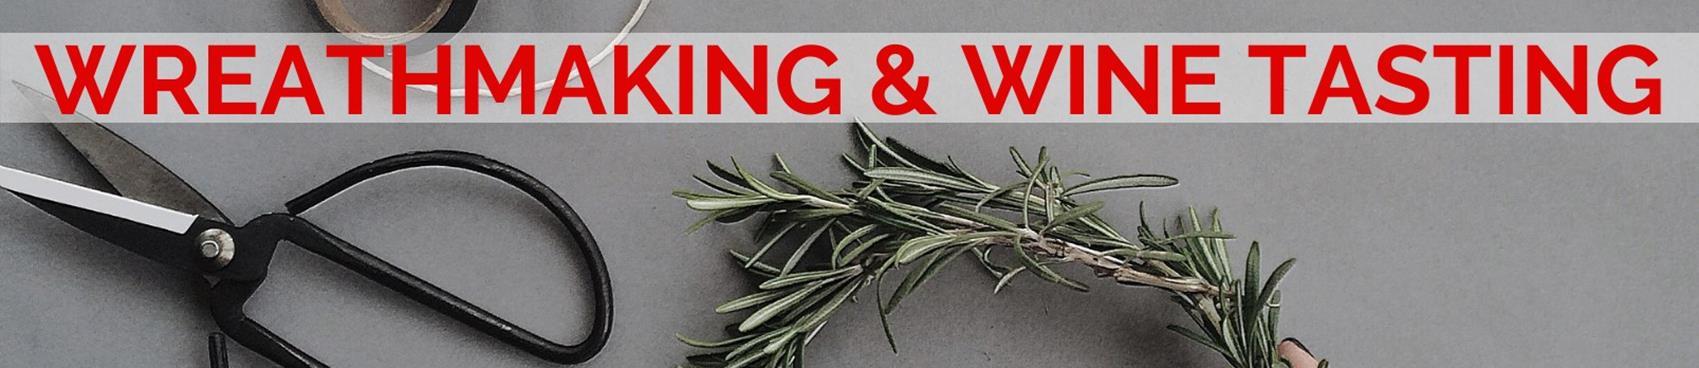 Purchase Tickets to Wreath Making Workshop and Wine Tasting at Black Ridge Vineyards at Black Ridge Vineyards on CellarPass